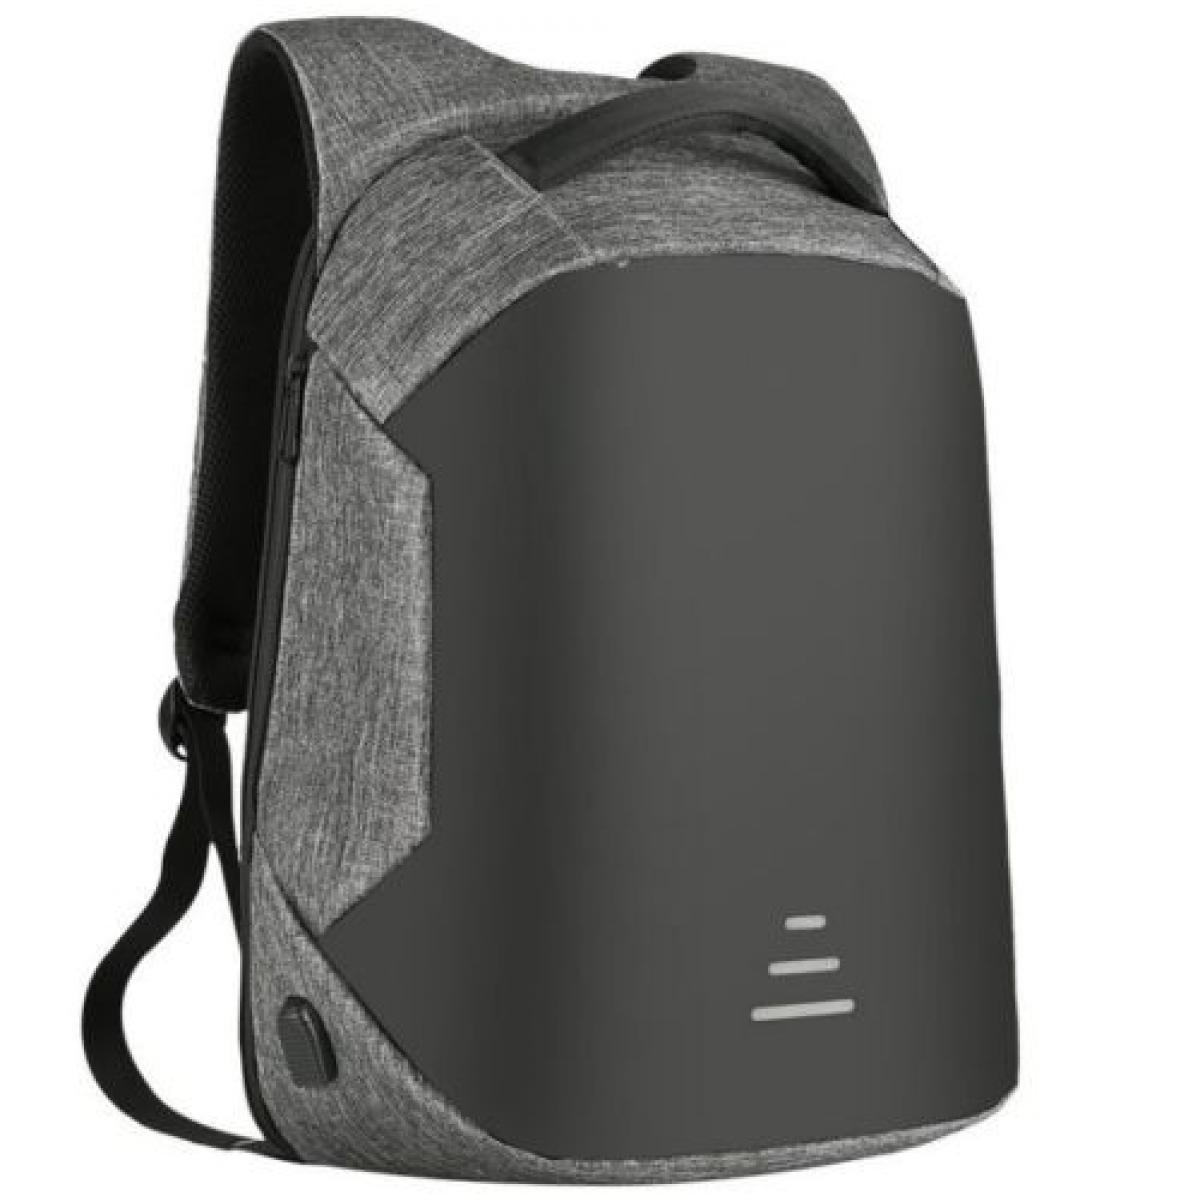 NOTEBOOK BAG OKADE S41 15.6 COLOR صوت+USB ظهر+تطويلة ,Laptop Pc